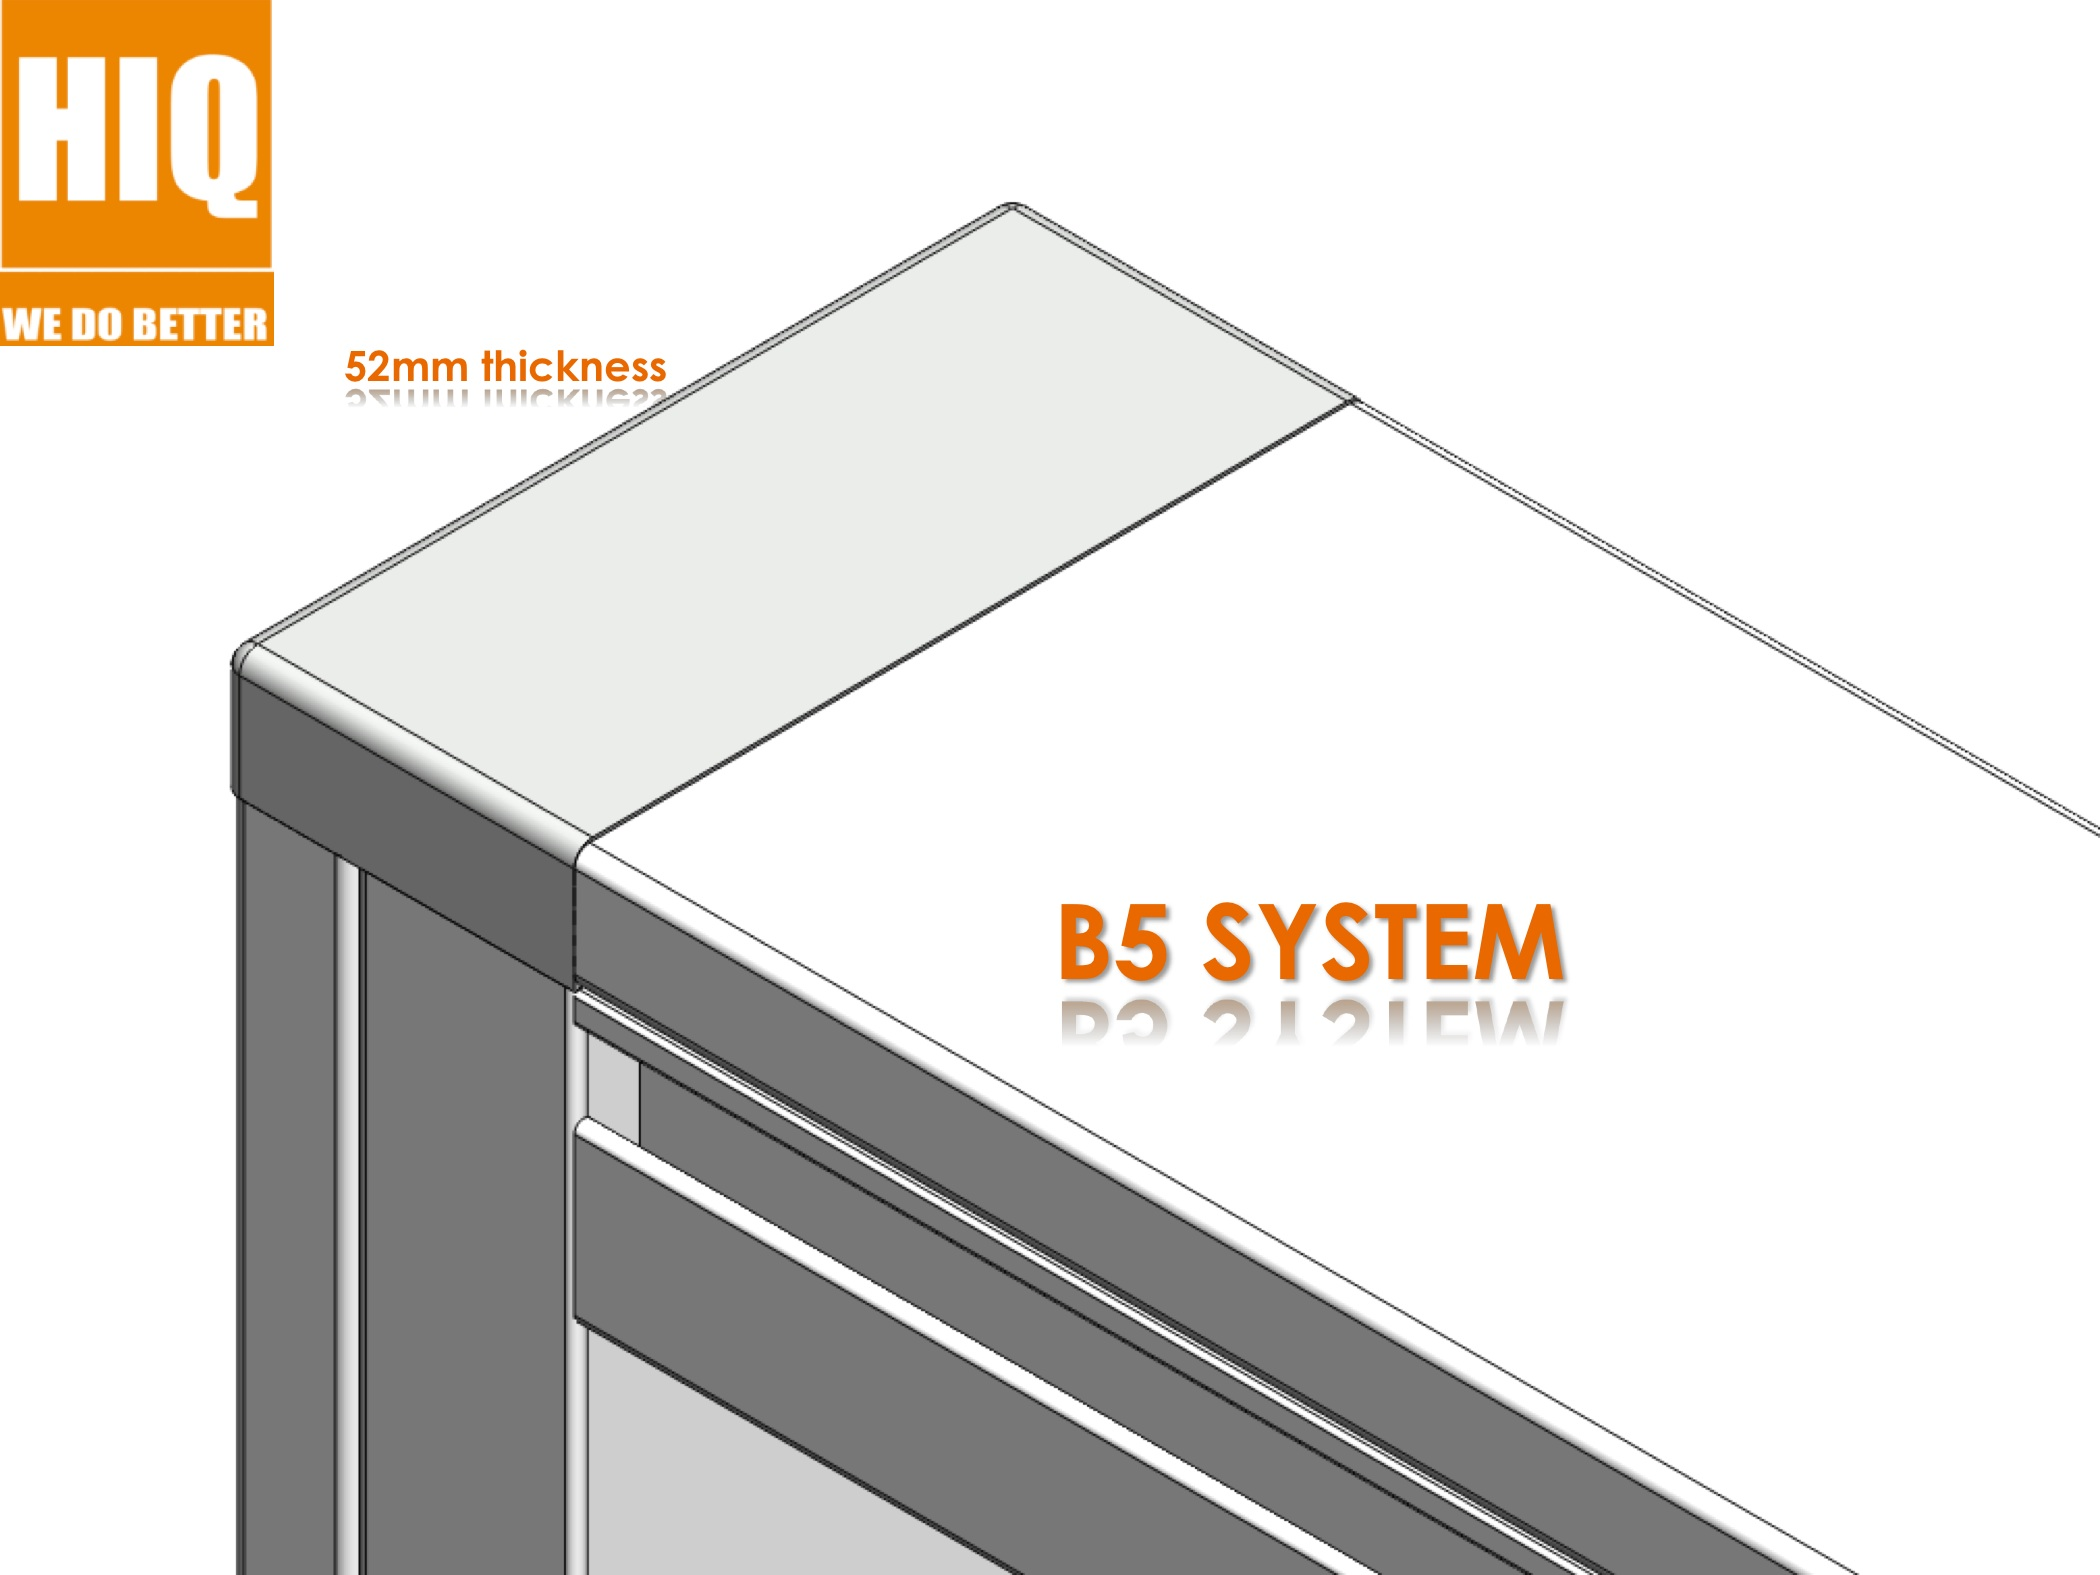 B5 System